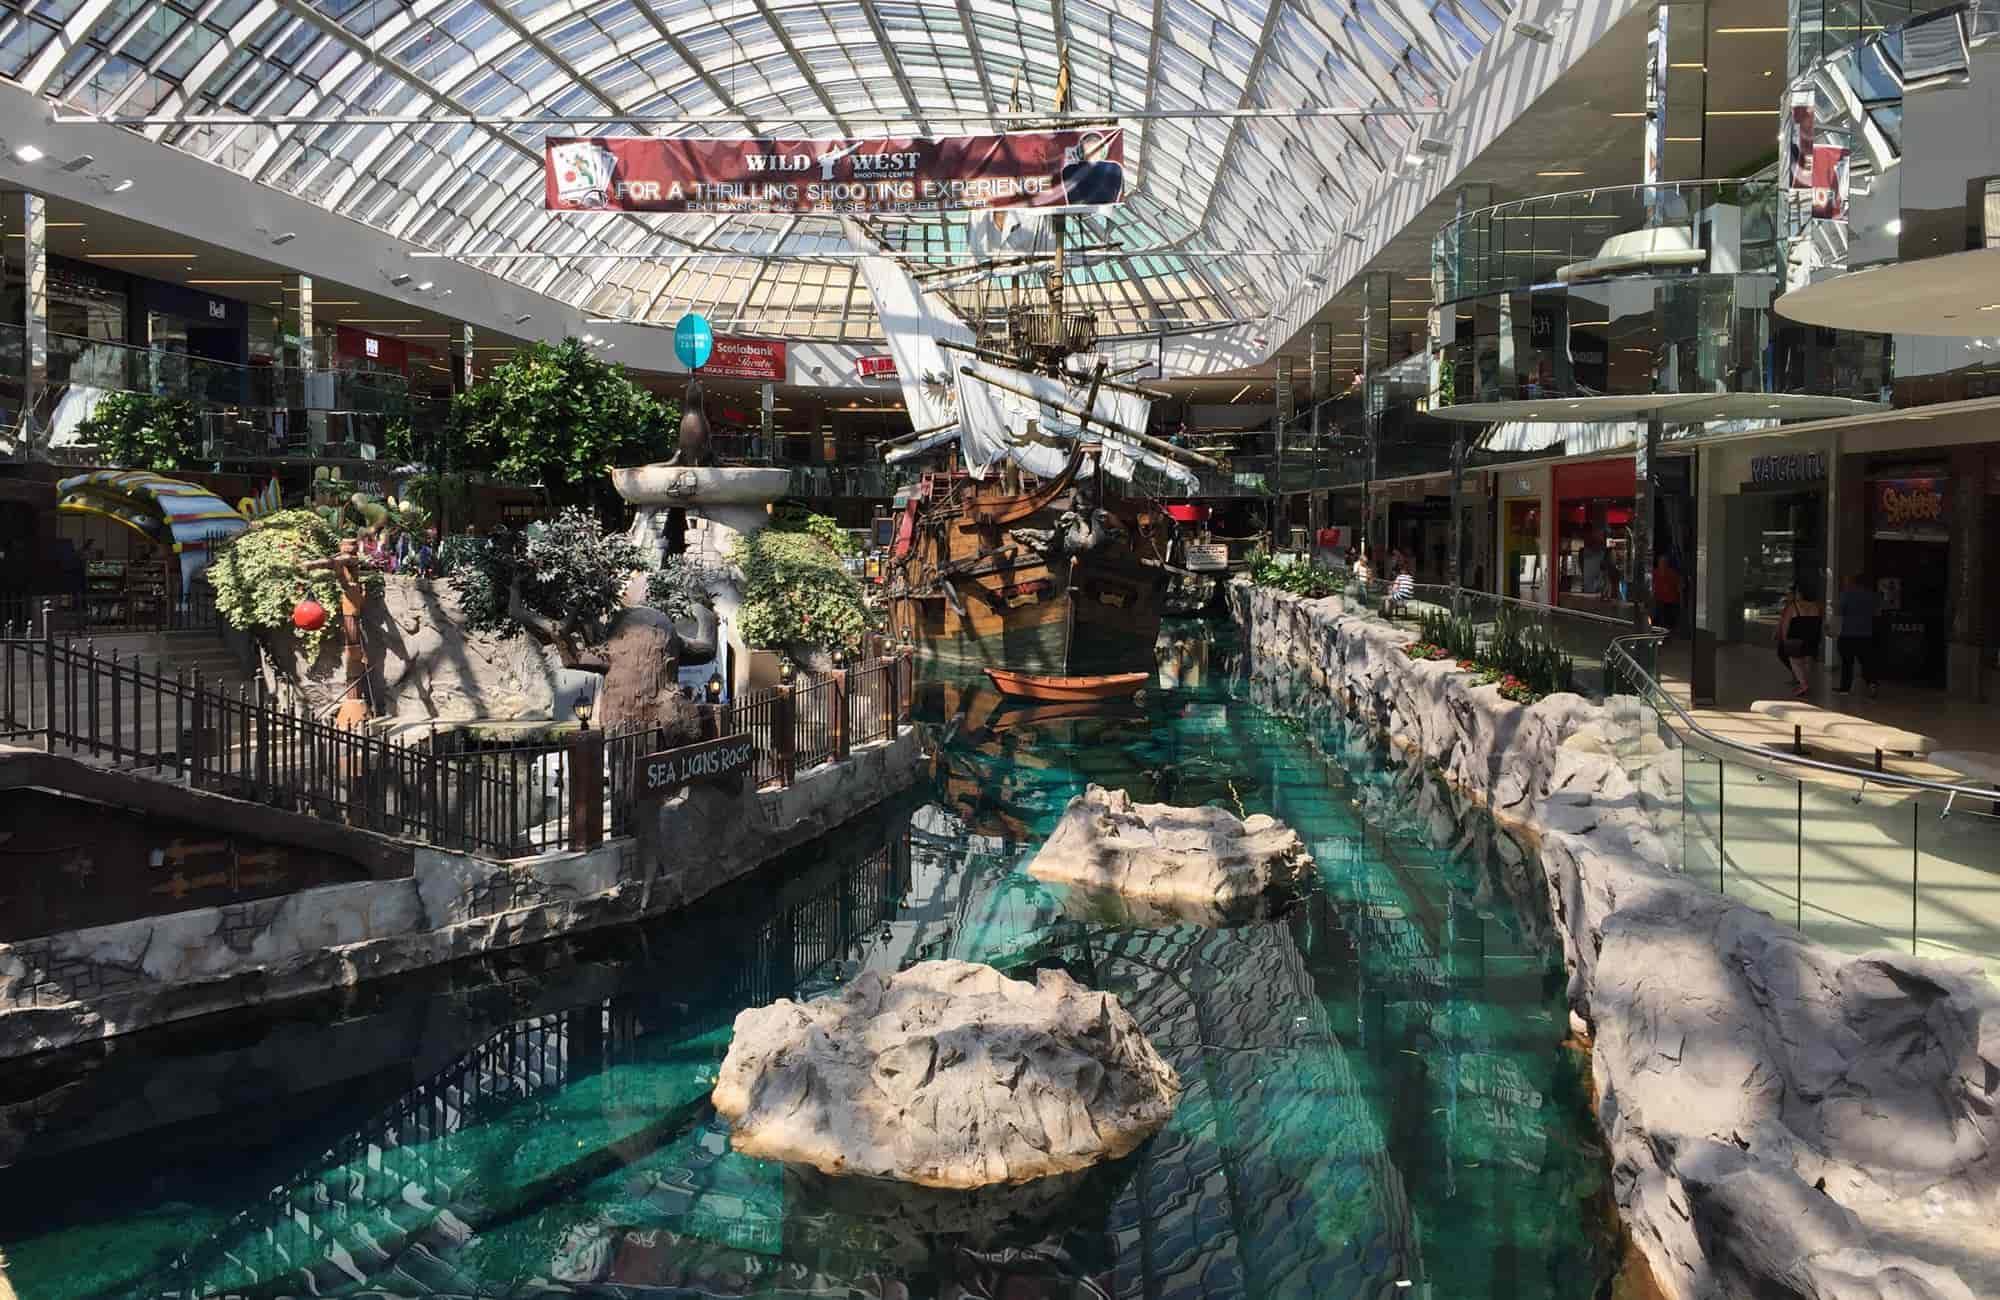 Voyage au Canada - west edmonton wall - Amplitudes